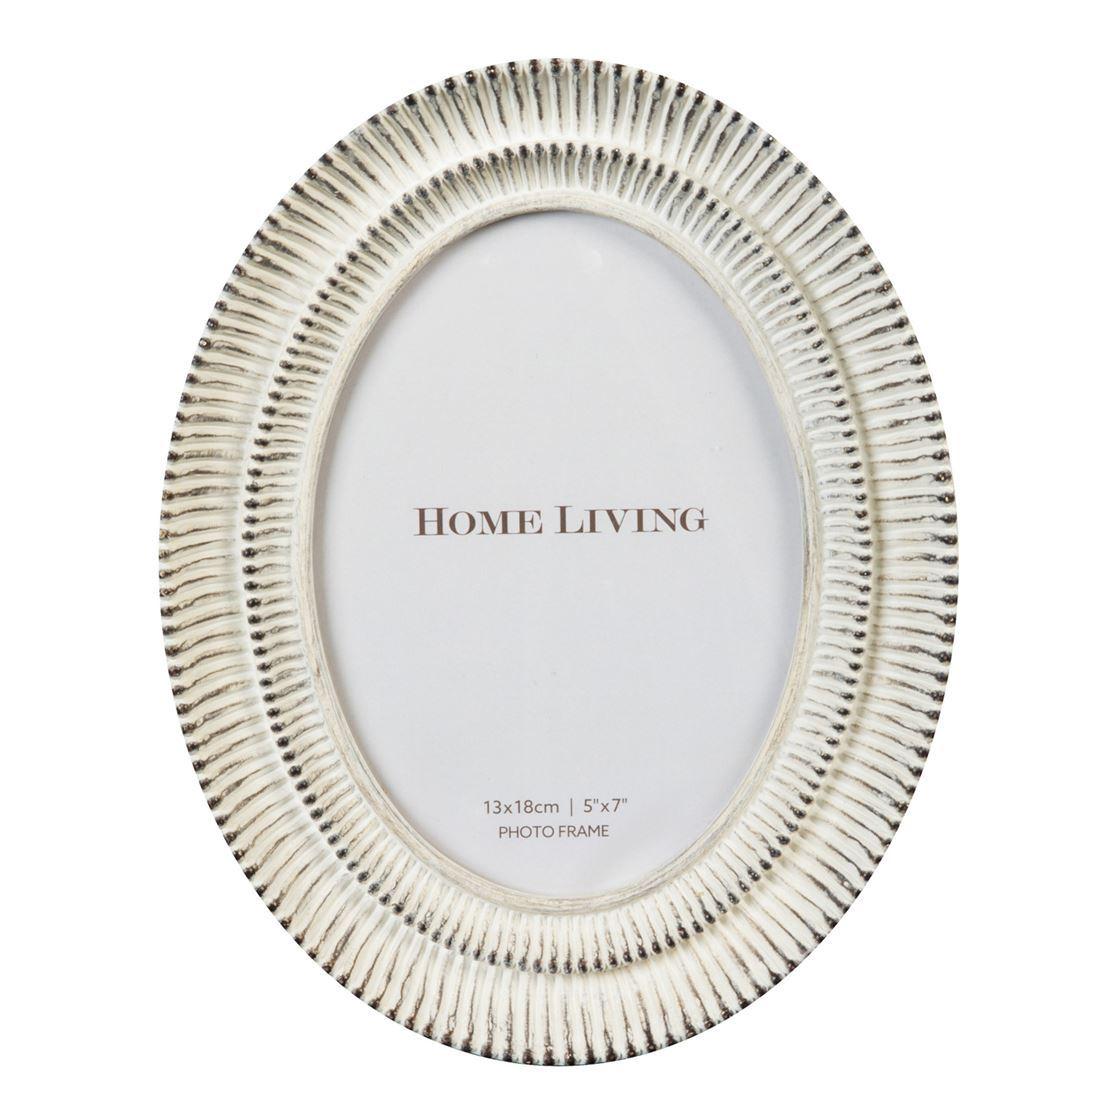 Botanica Cream Finish Oval Resin Frame 5 X 7 5017224791237 Ebay